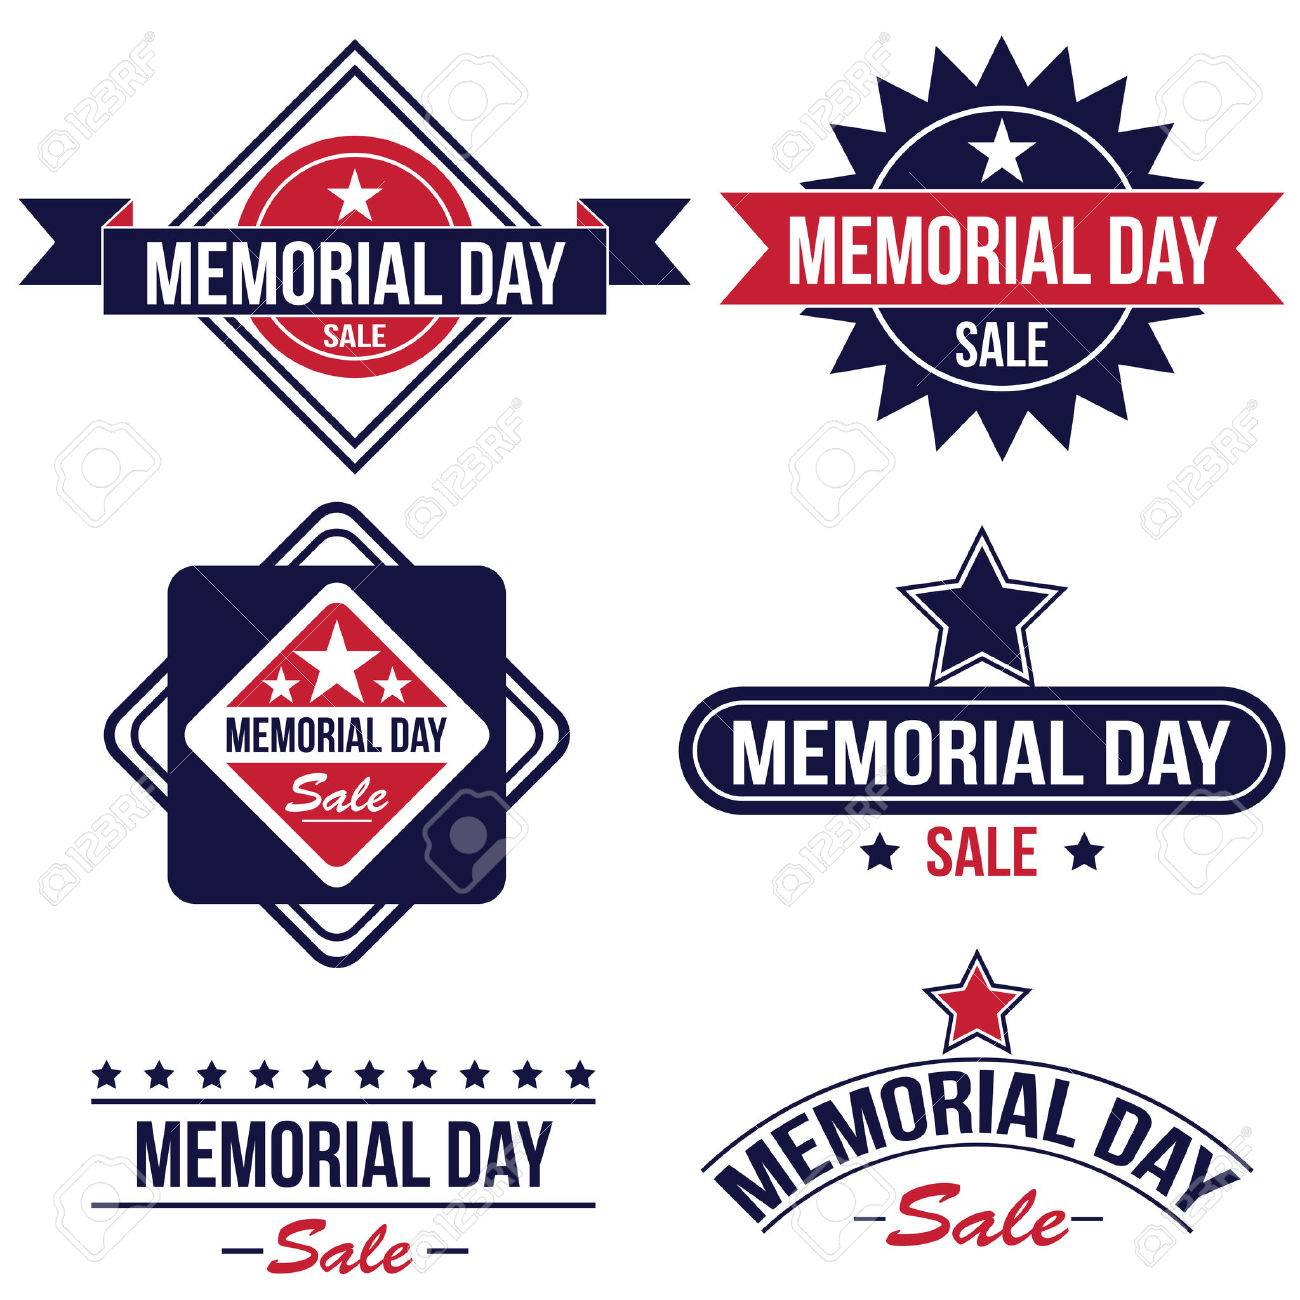 Memorial day sale badges - 42863346